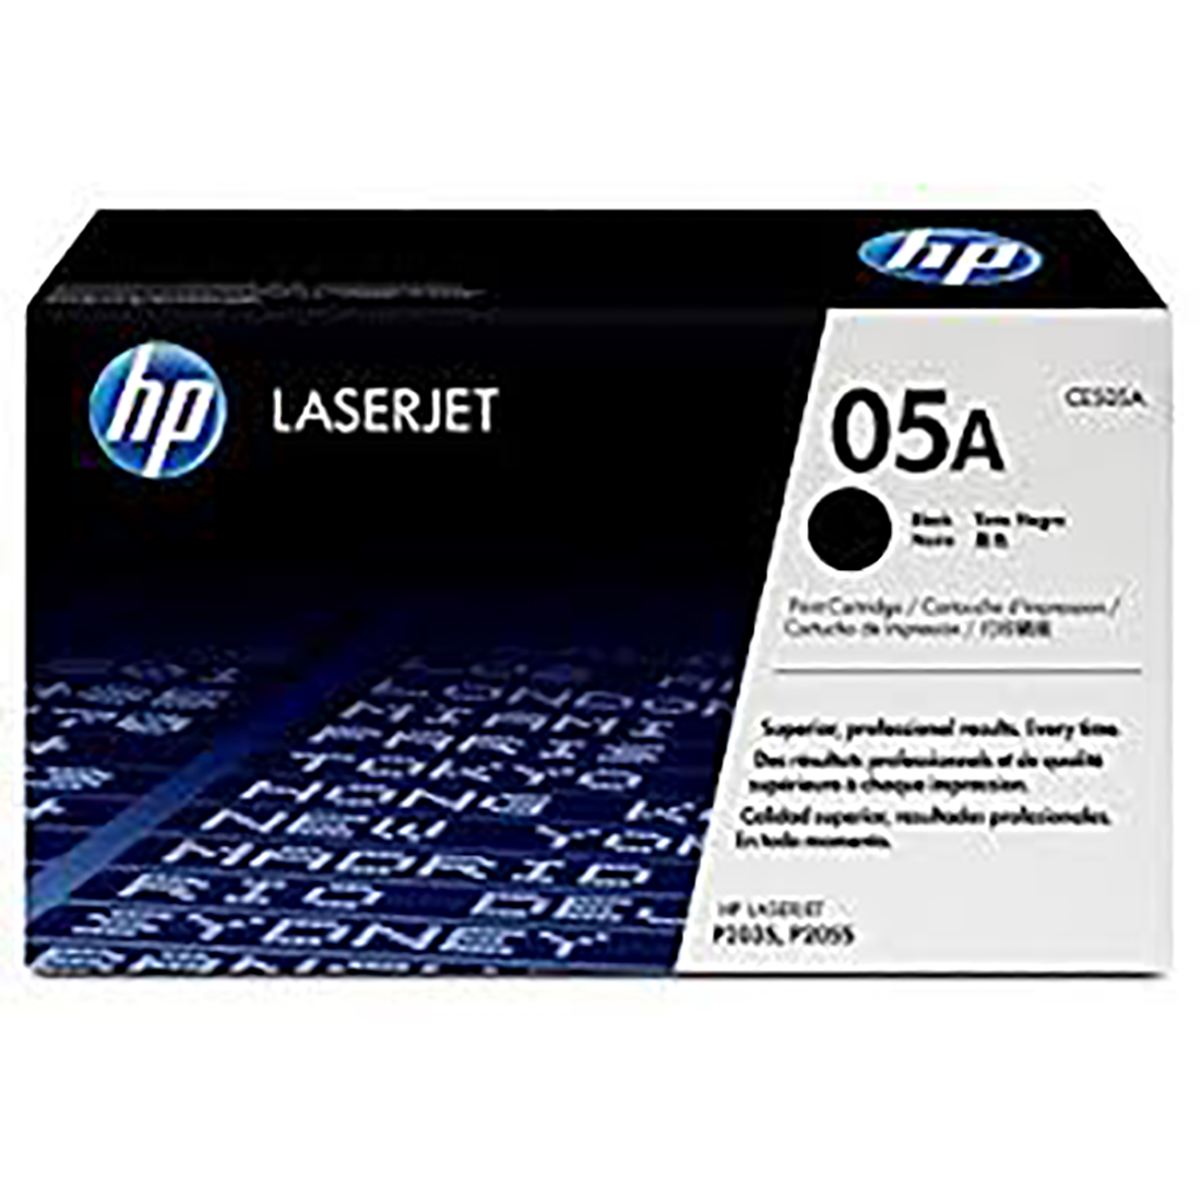 HP CE505A Black LaserJet Toner Cartridge